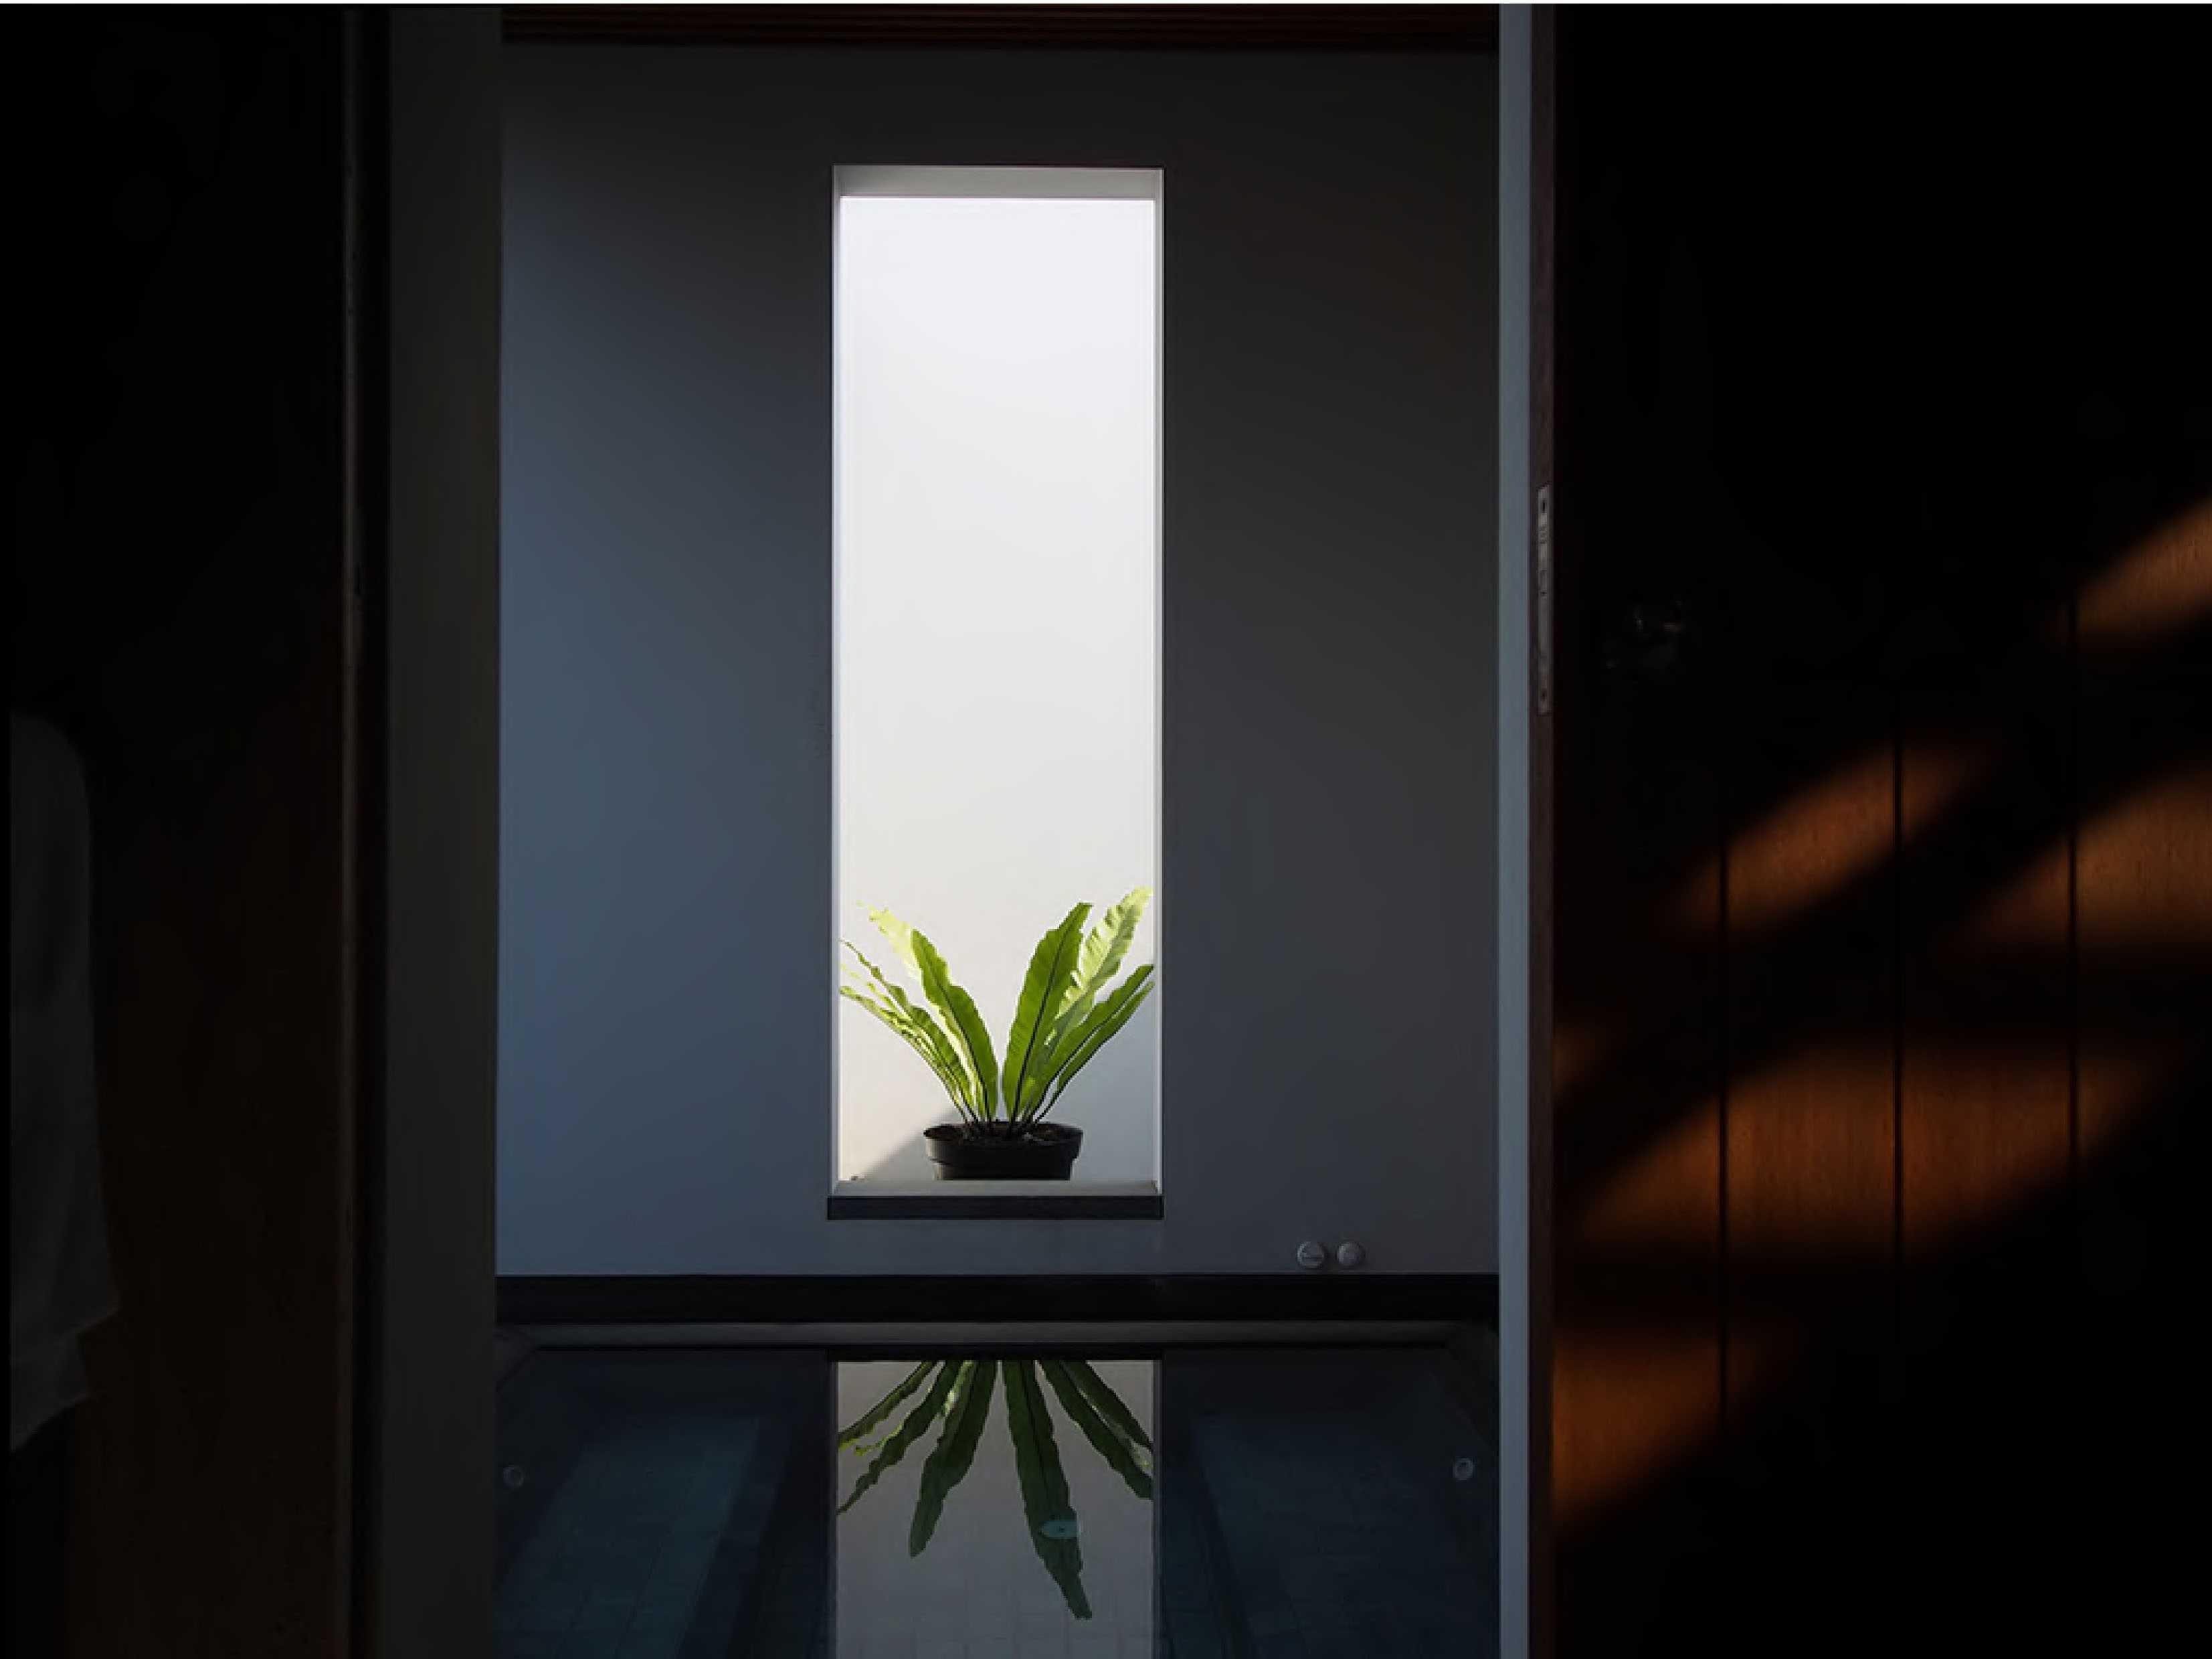 Studio Air Putih P_House Bsd, Serpong Bsd, Serpong Interior Details   25071